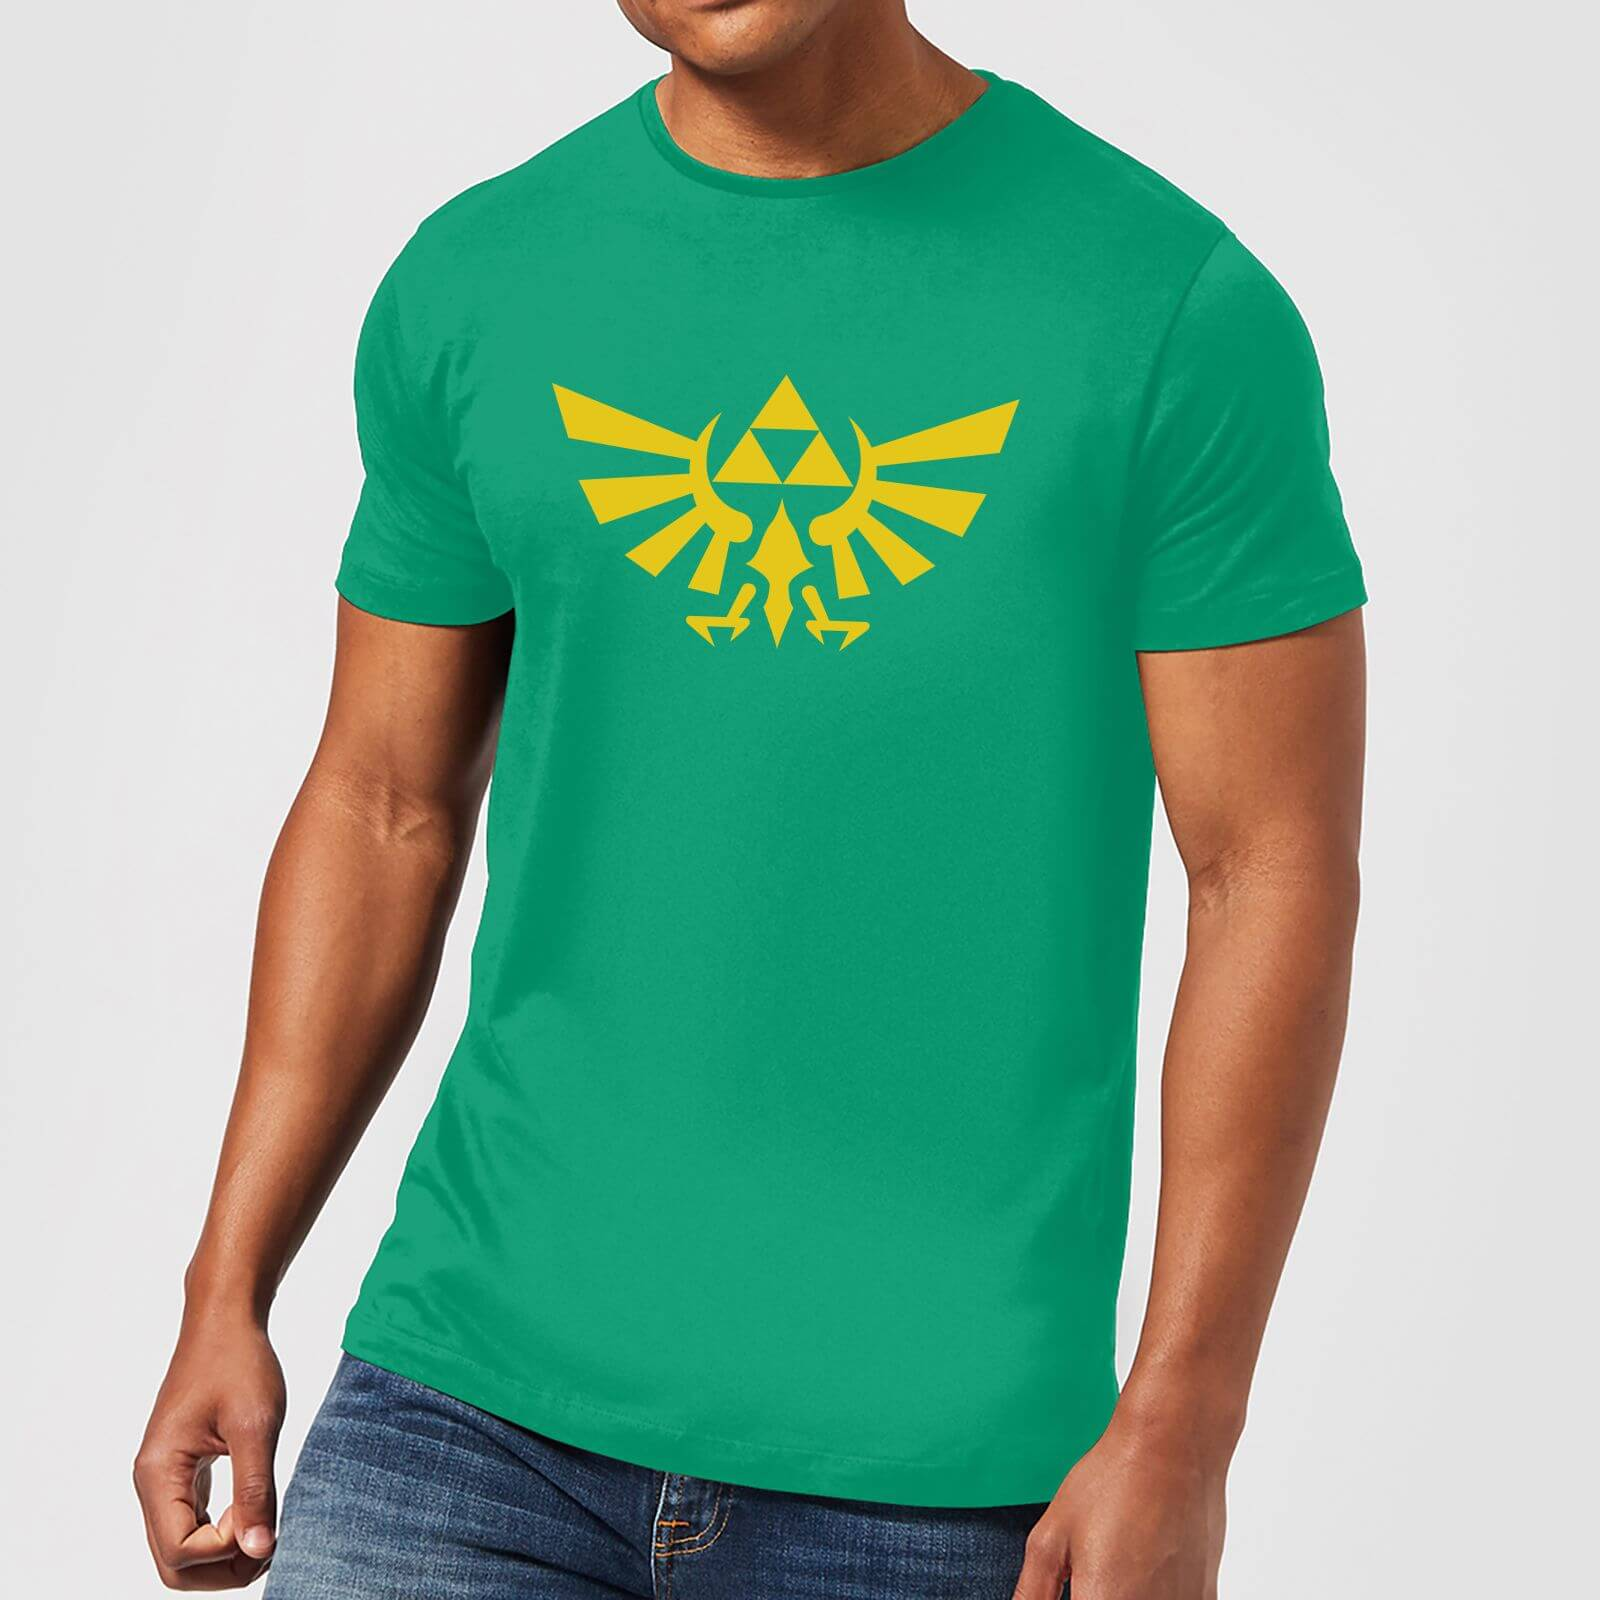 7474147b8 Nintendo The Legend Of Zelda Hyrule Men's T-Shirt - Green Clothing   Zavvi  US